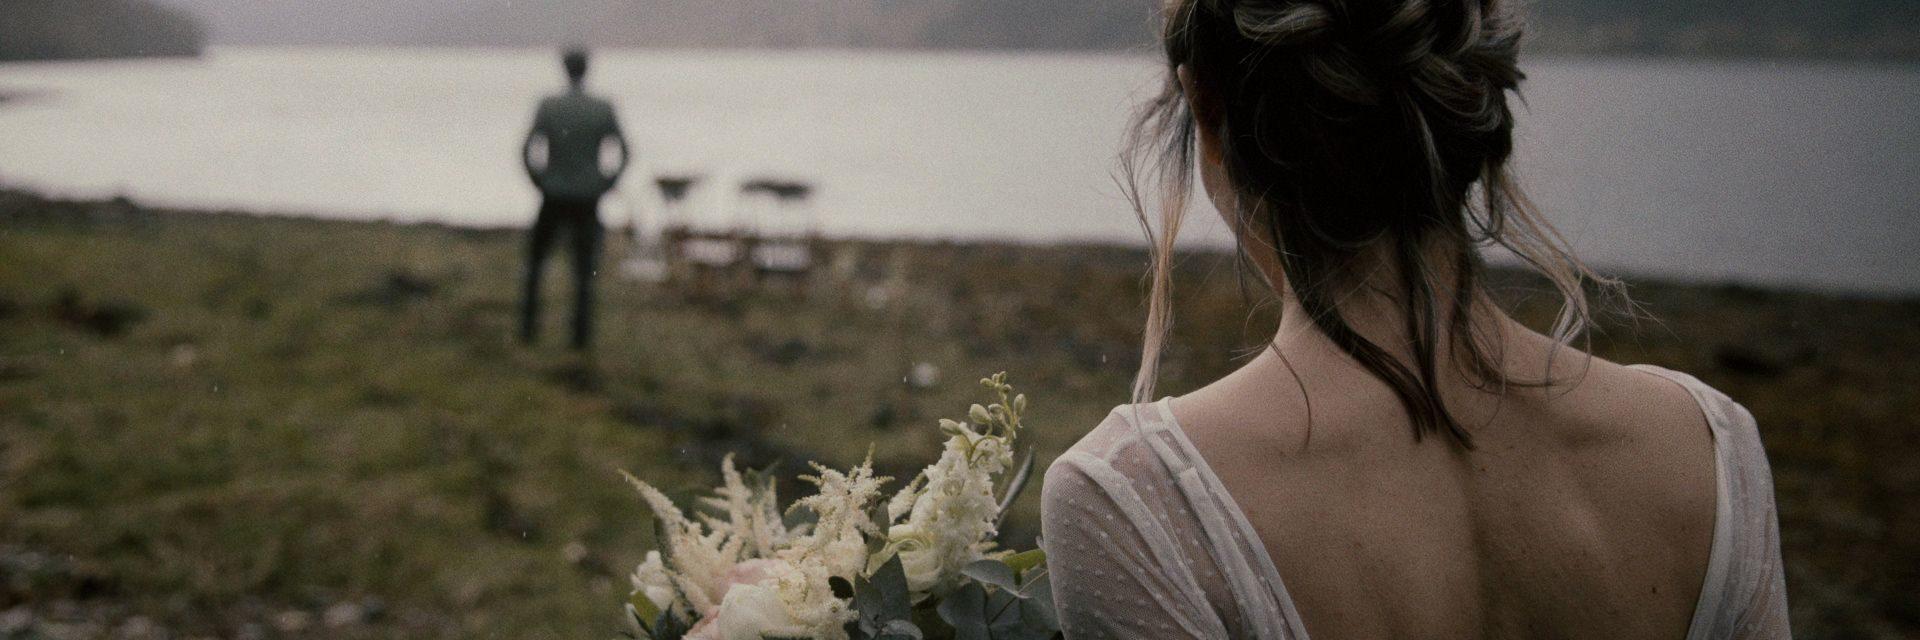 Noto-wedding-videographer-cinemate-films-02